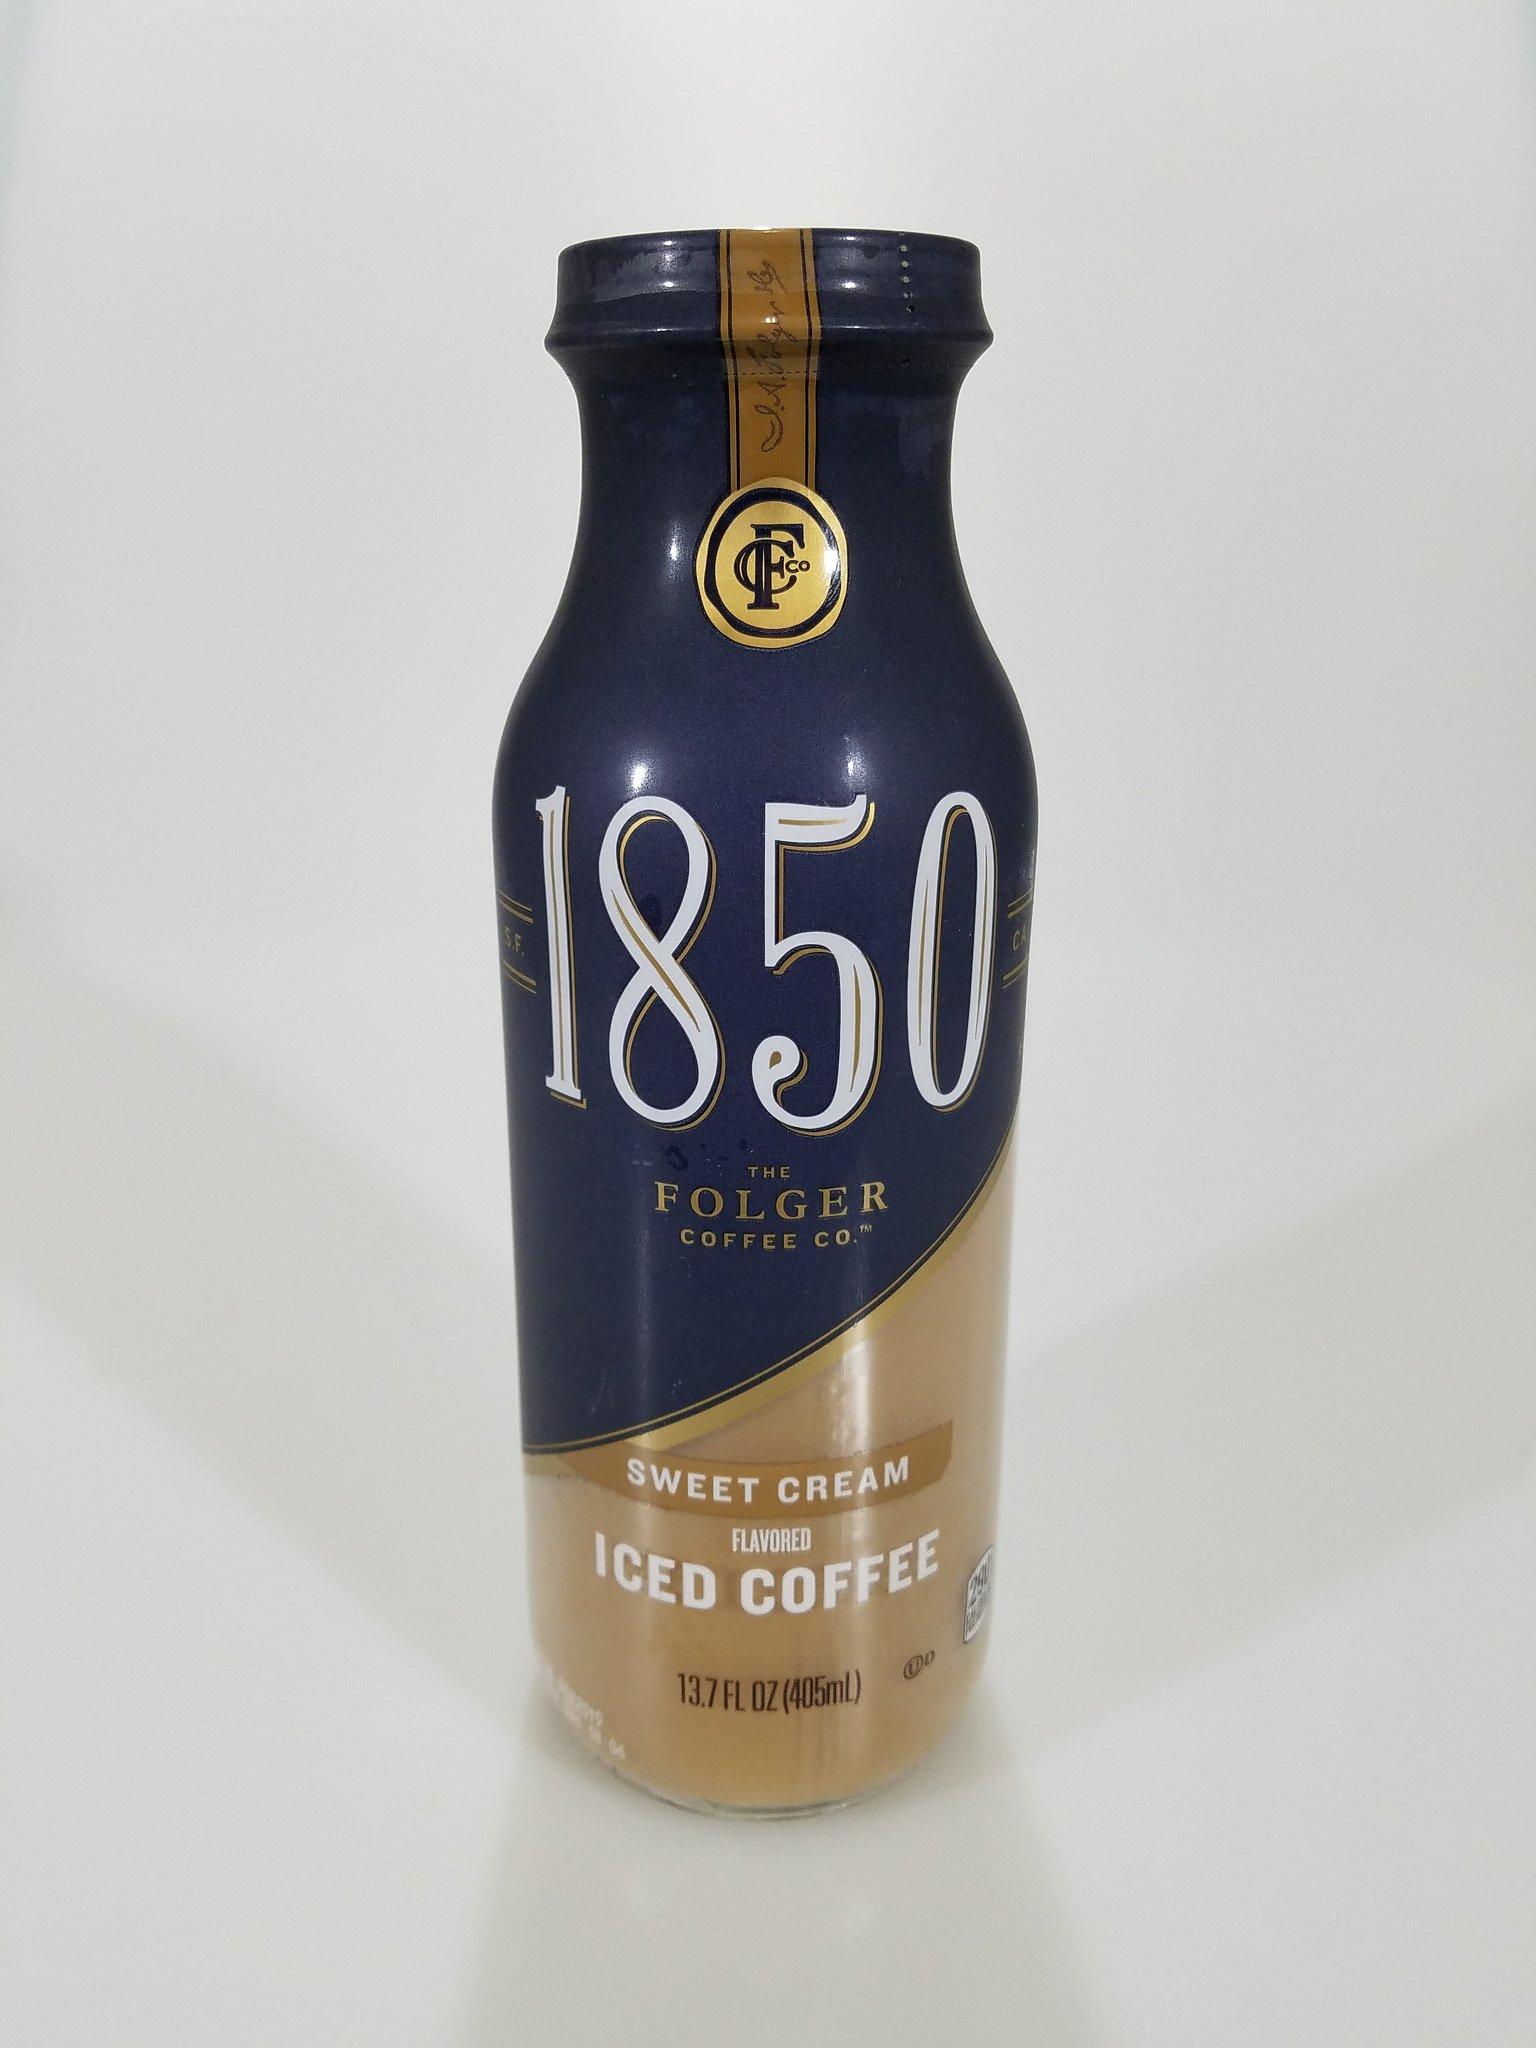 Folgers 1850 Premium Bottled Iced Coffee (Sweet Cream)